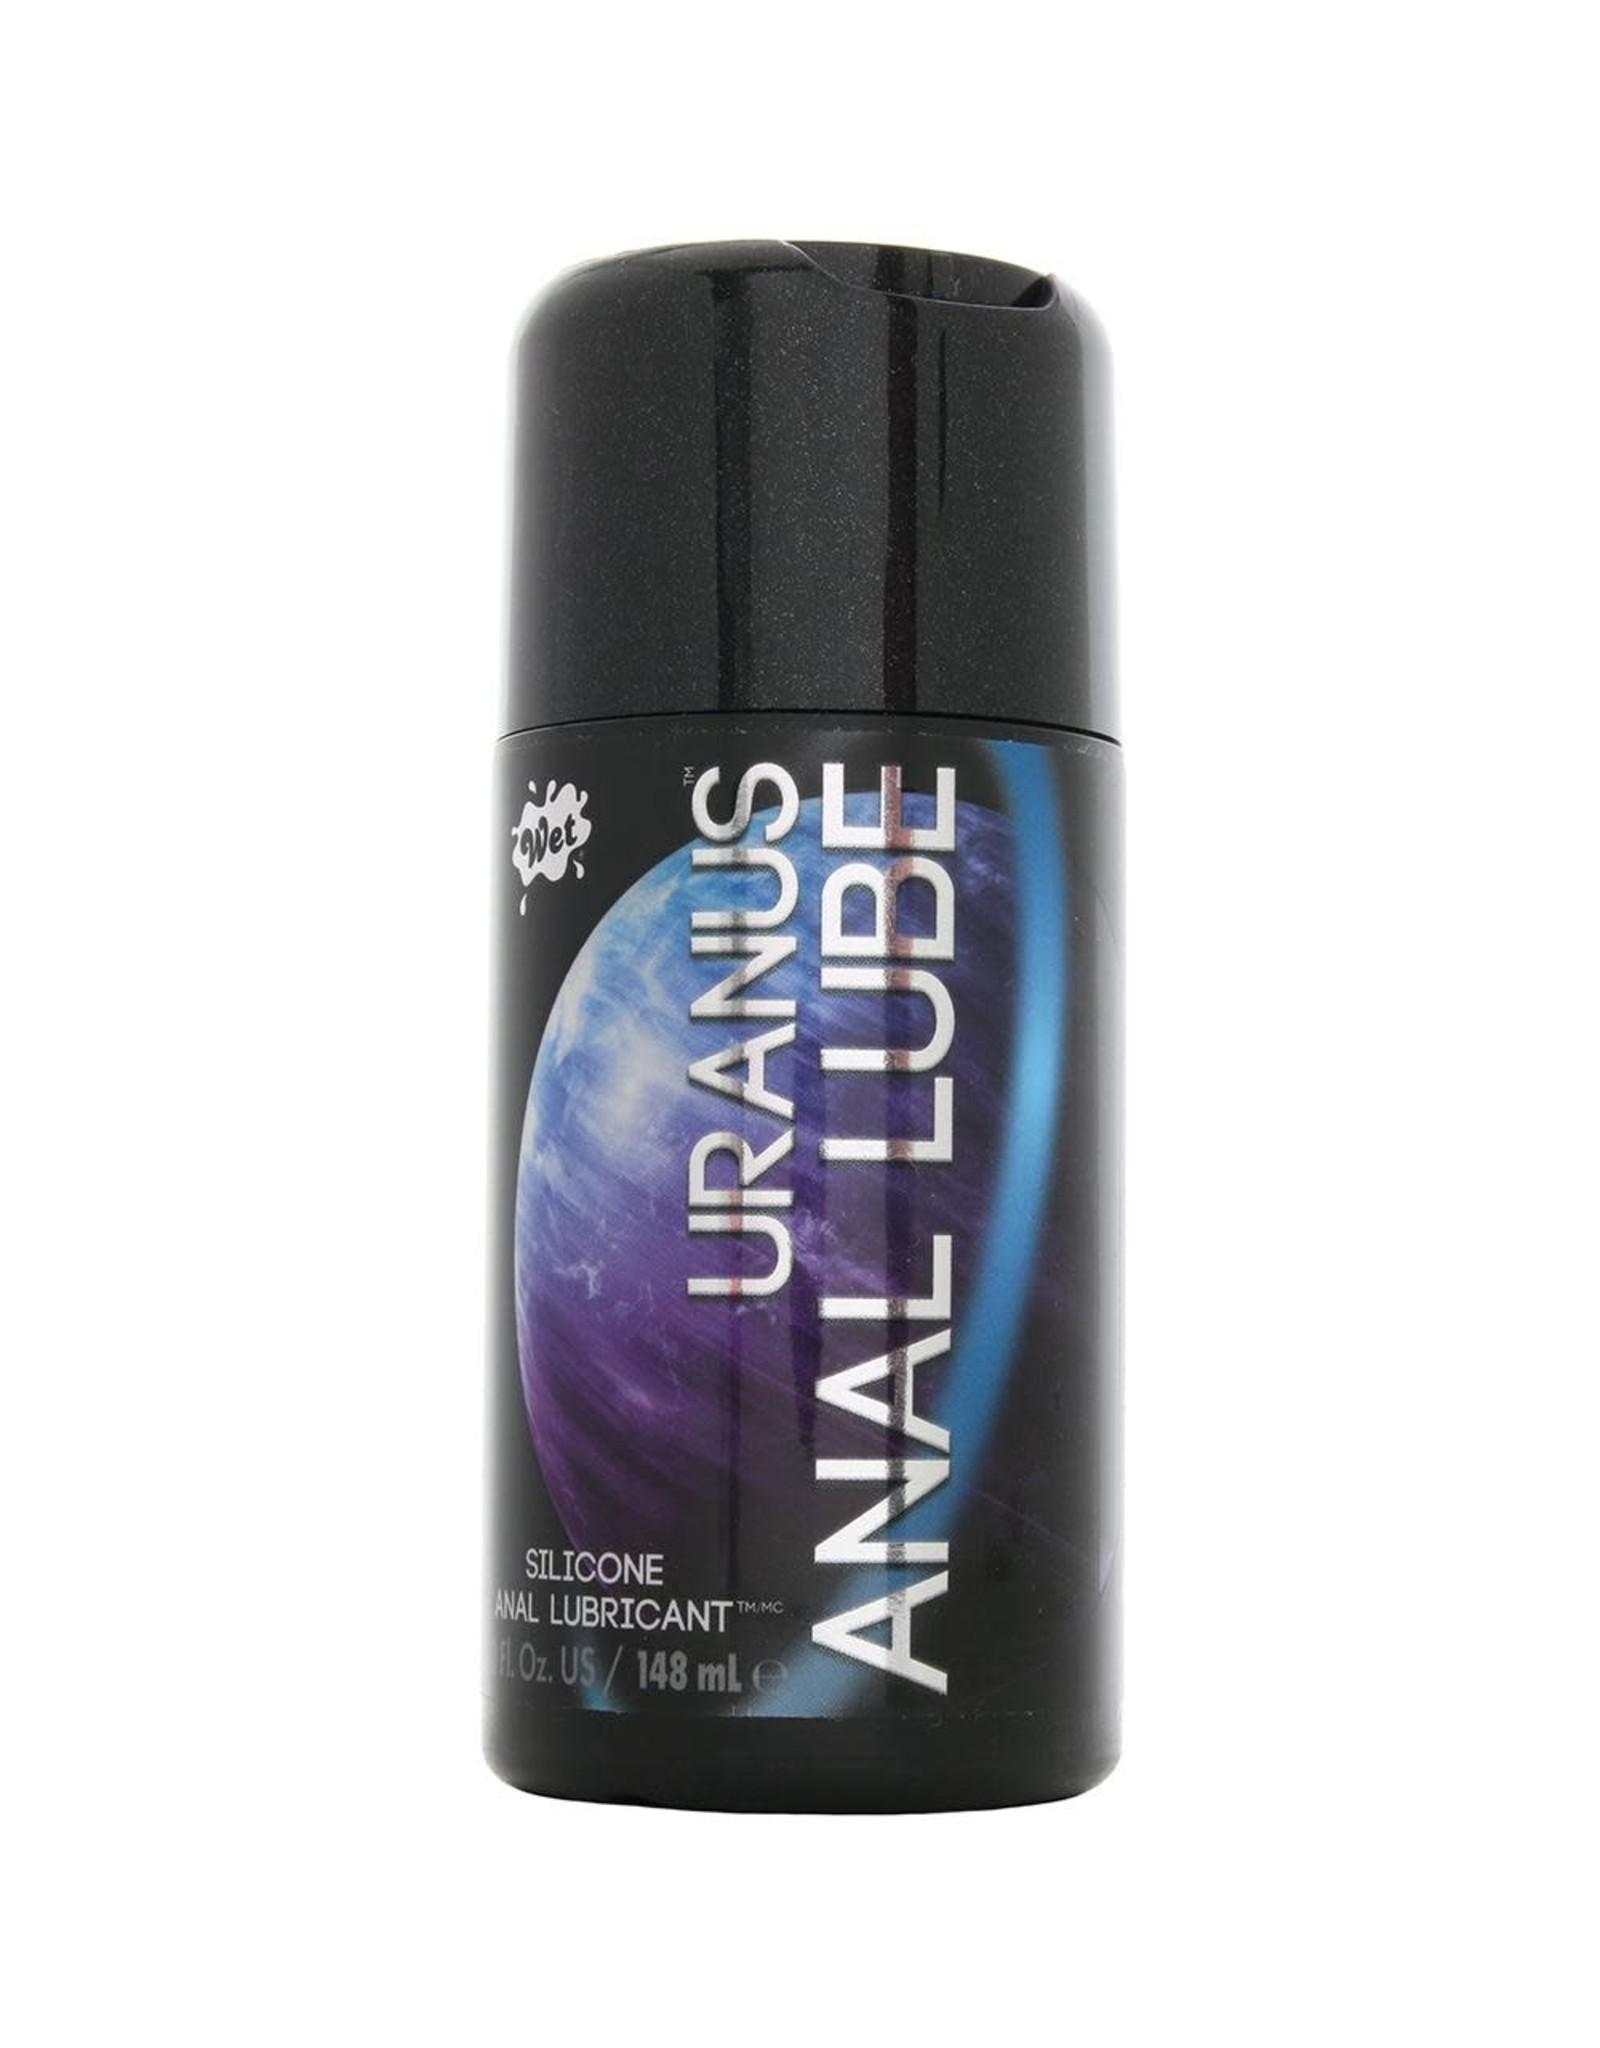 Uranus Silicone Based Anal Lubricant - 5oz